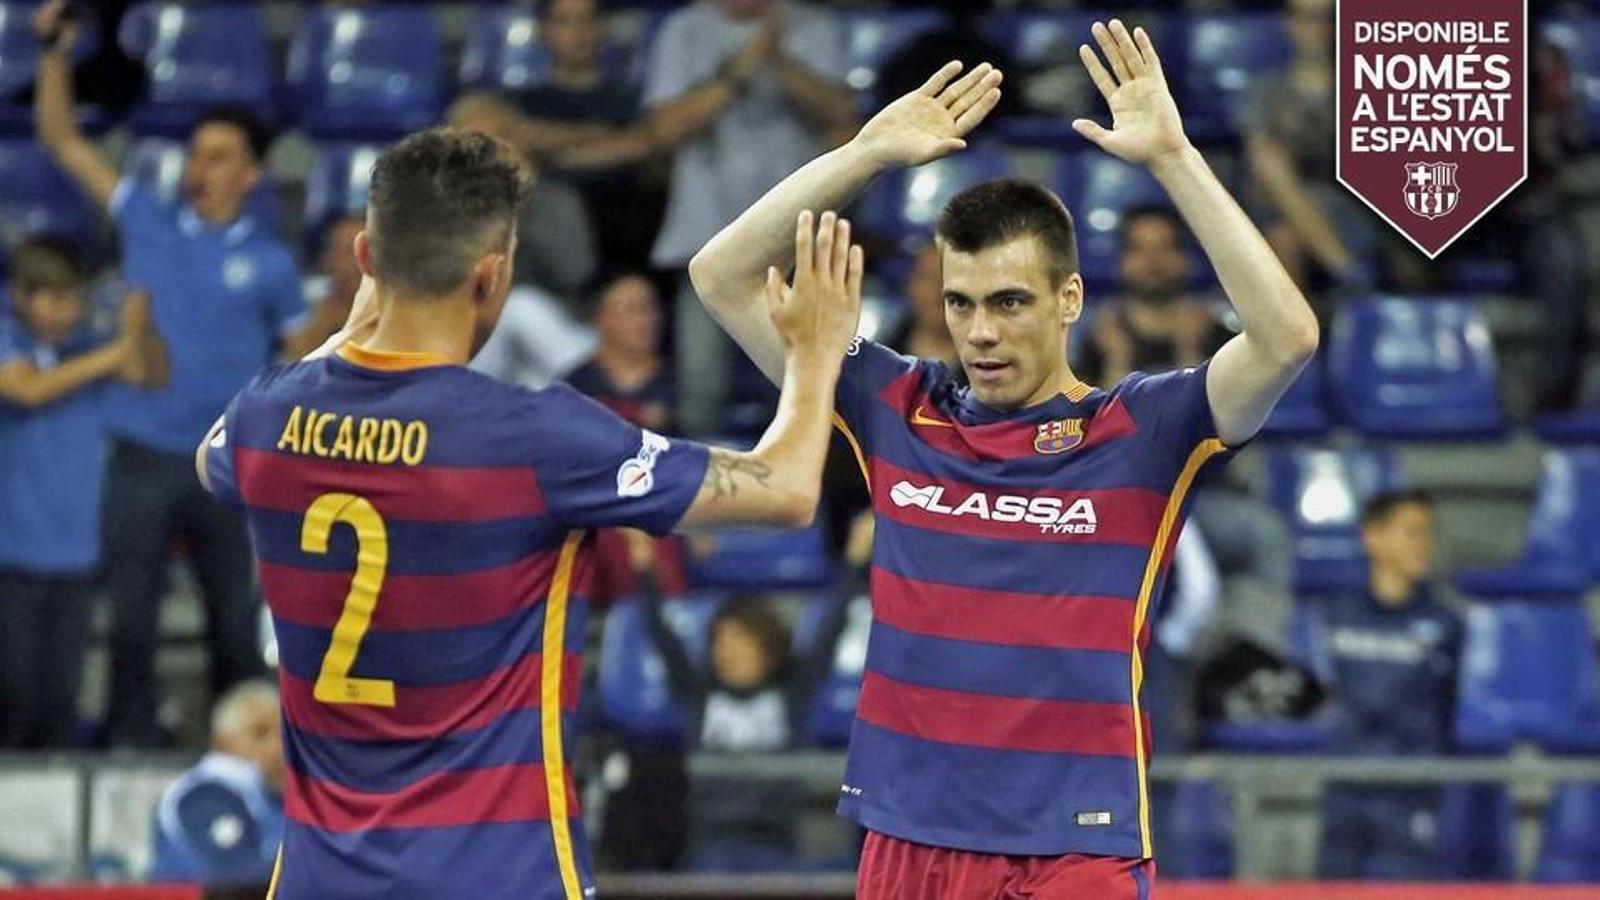 Aicardo celebra un gol amb Sergio Lozano